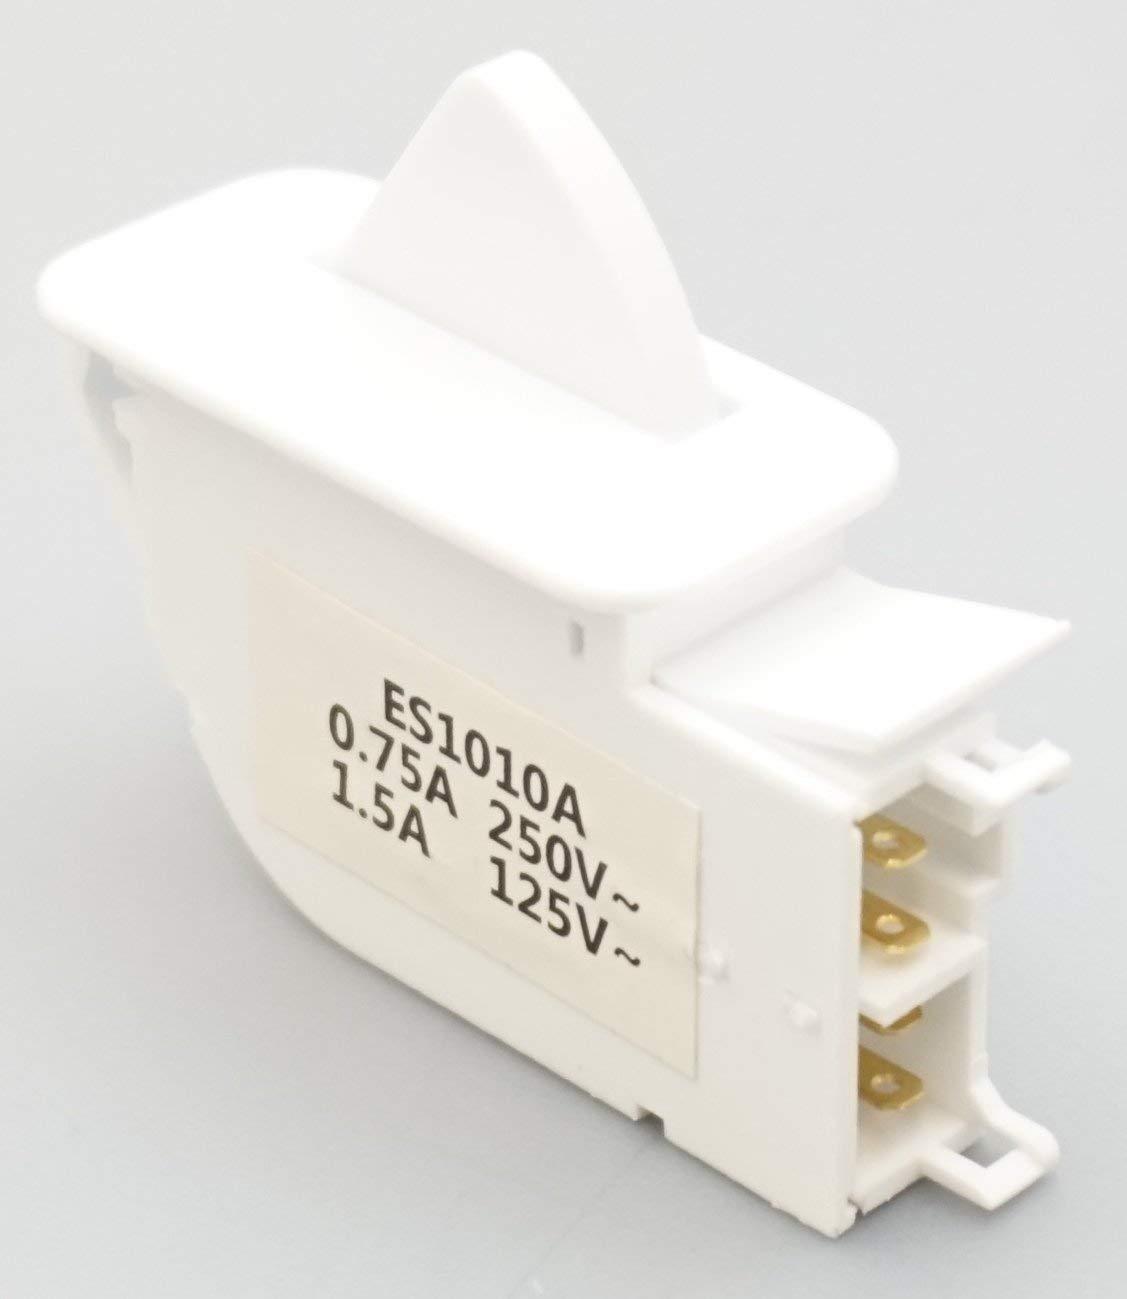 Supco ES1010A Refrigerator Light Switch for LG, AP4442090 PS3529268, 6600JB1010A